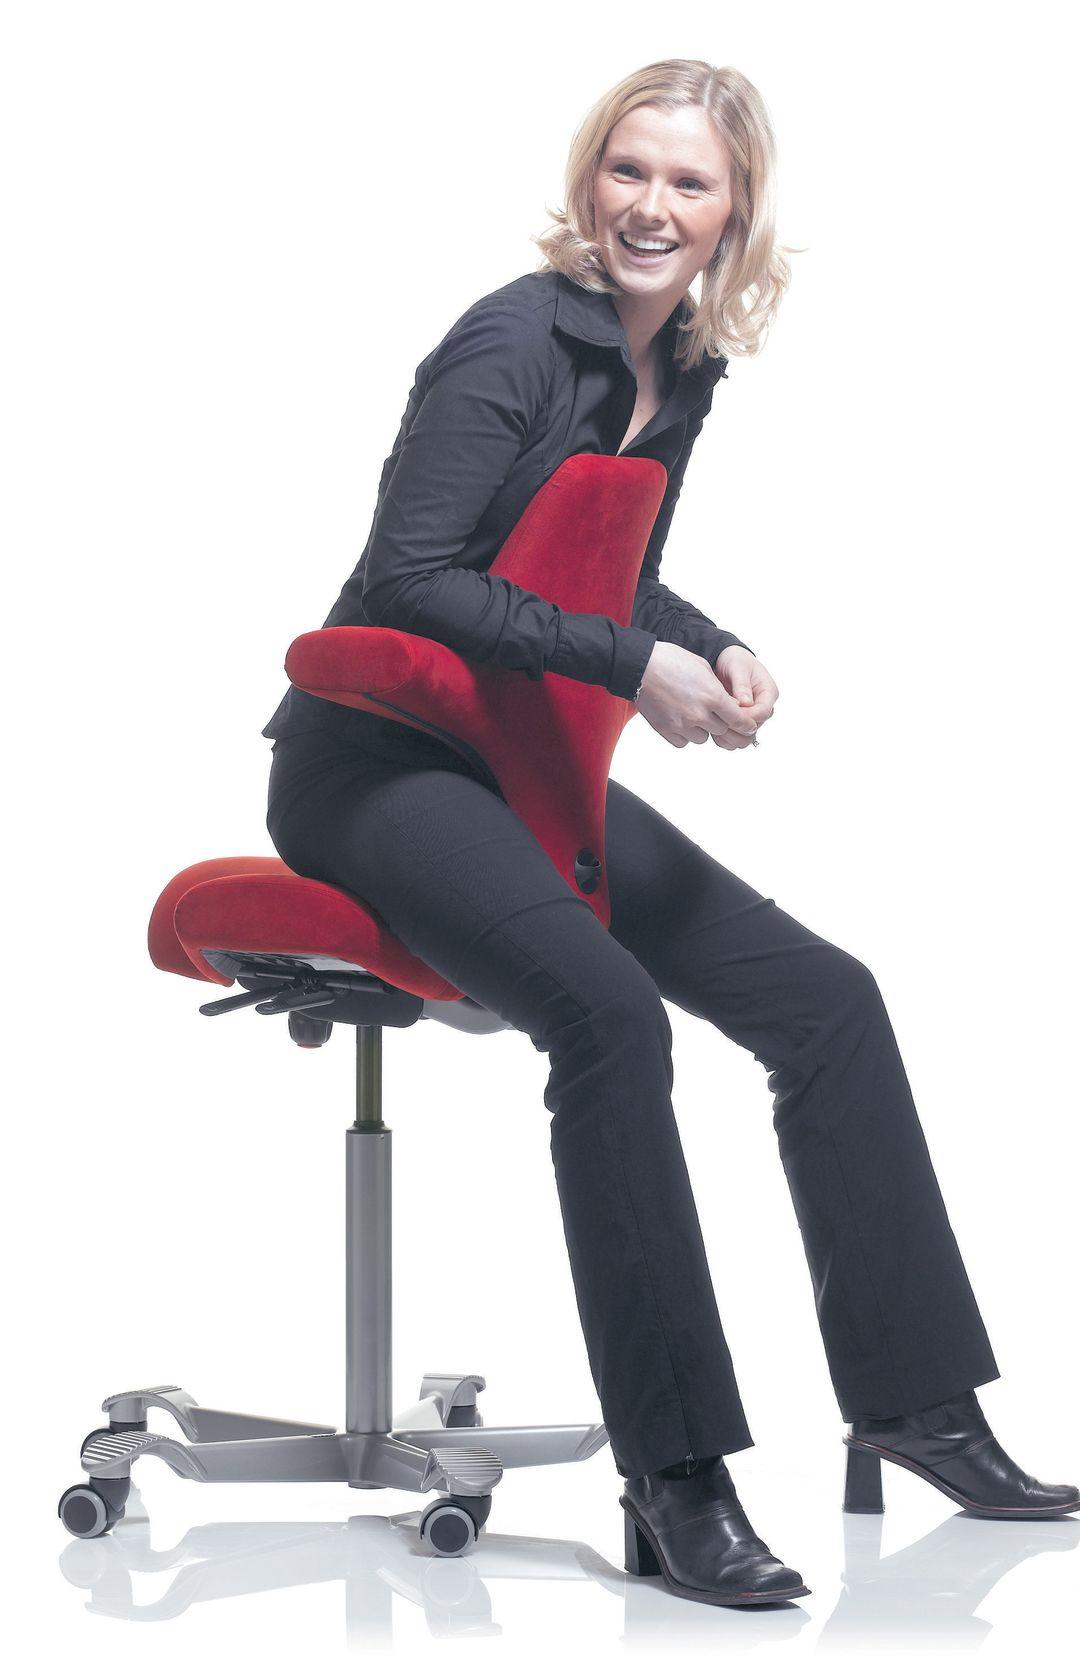 Hag Capisco Leder 8106 Antigo Soft Schwarz Gestell Silber 2 Gyepku. HAG  Capisco Office Chair